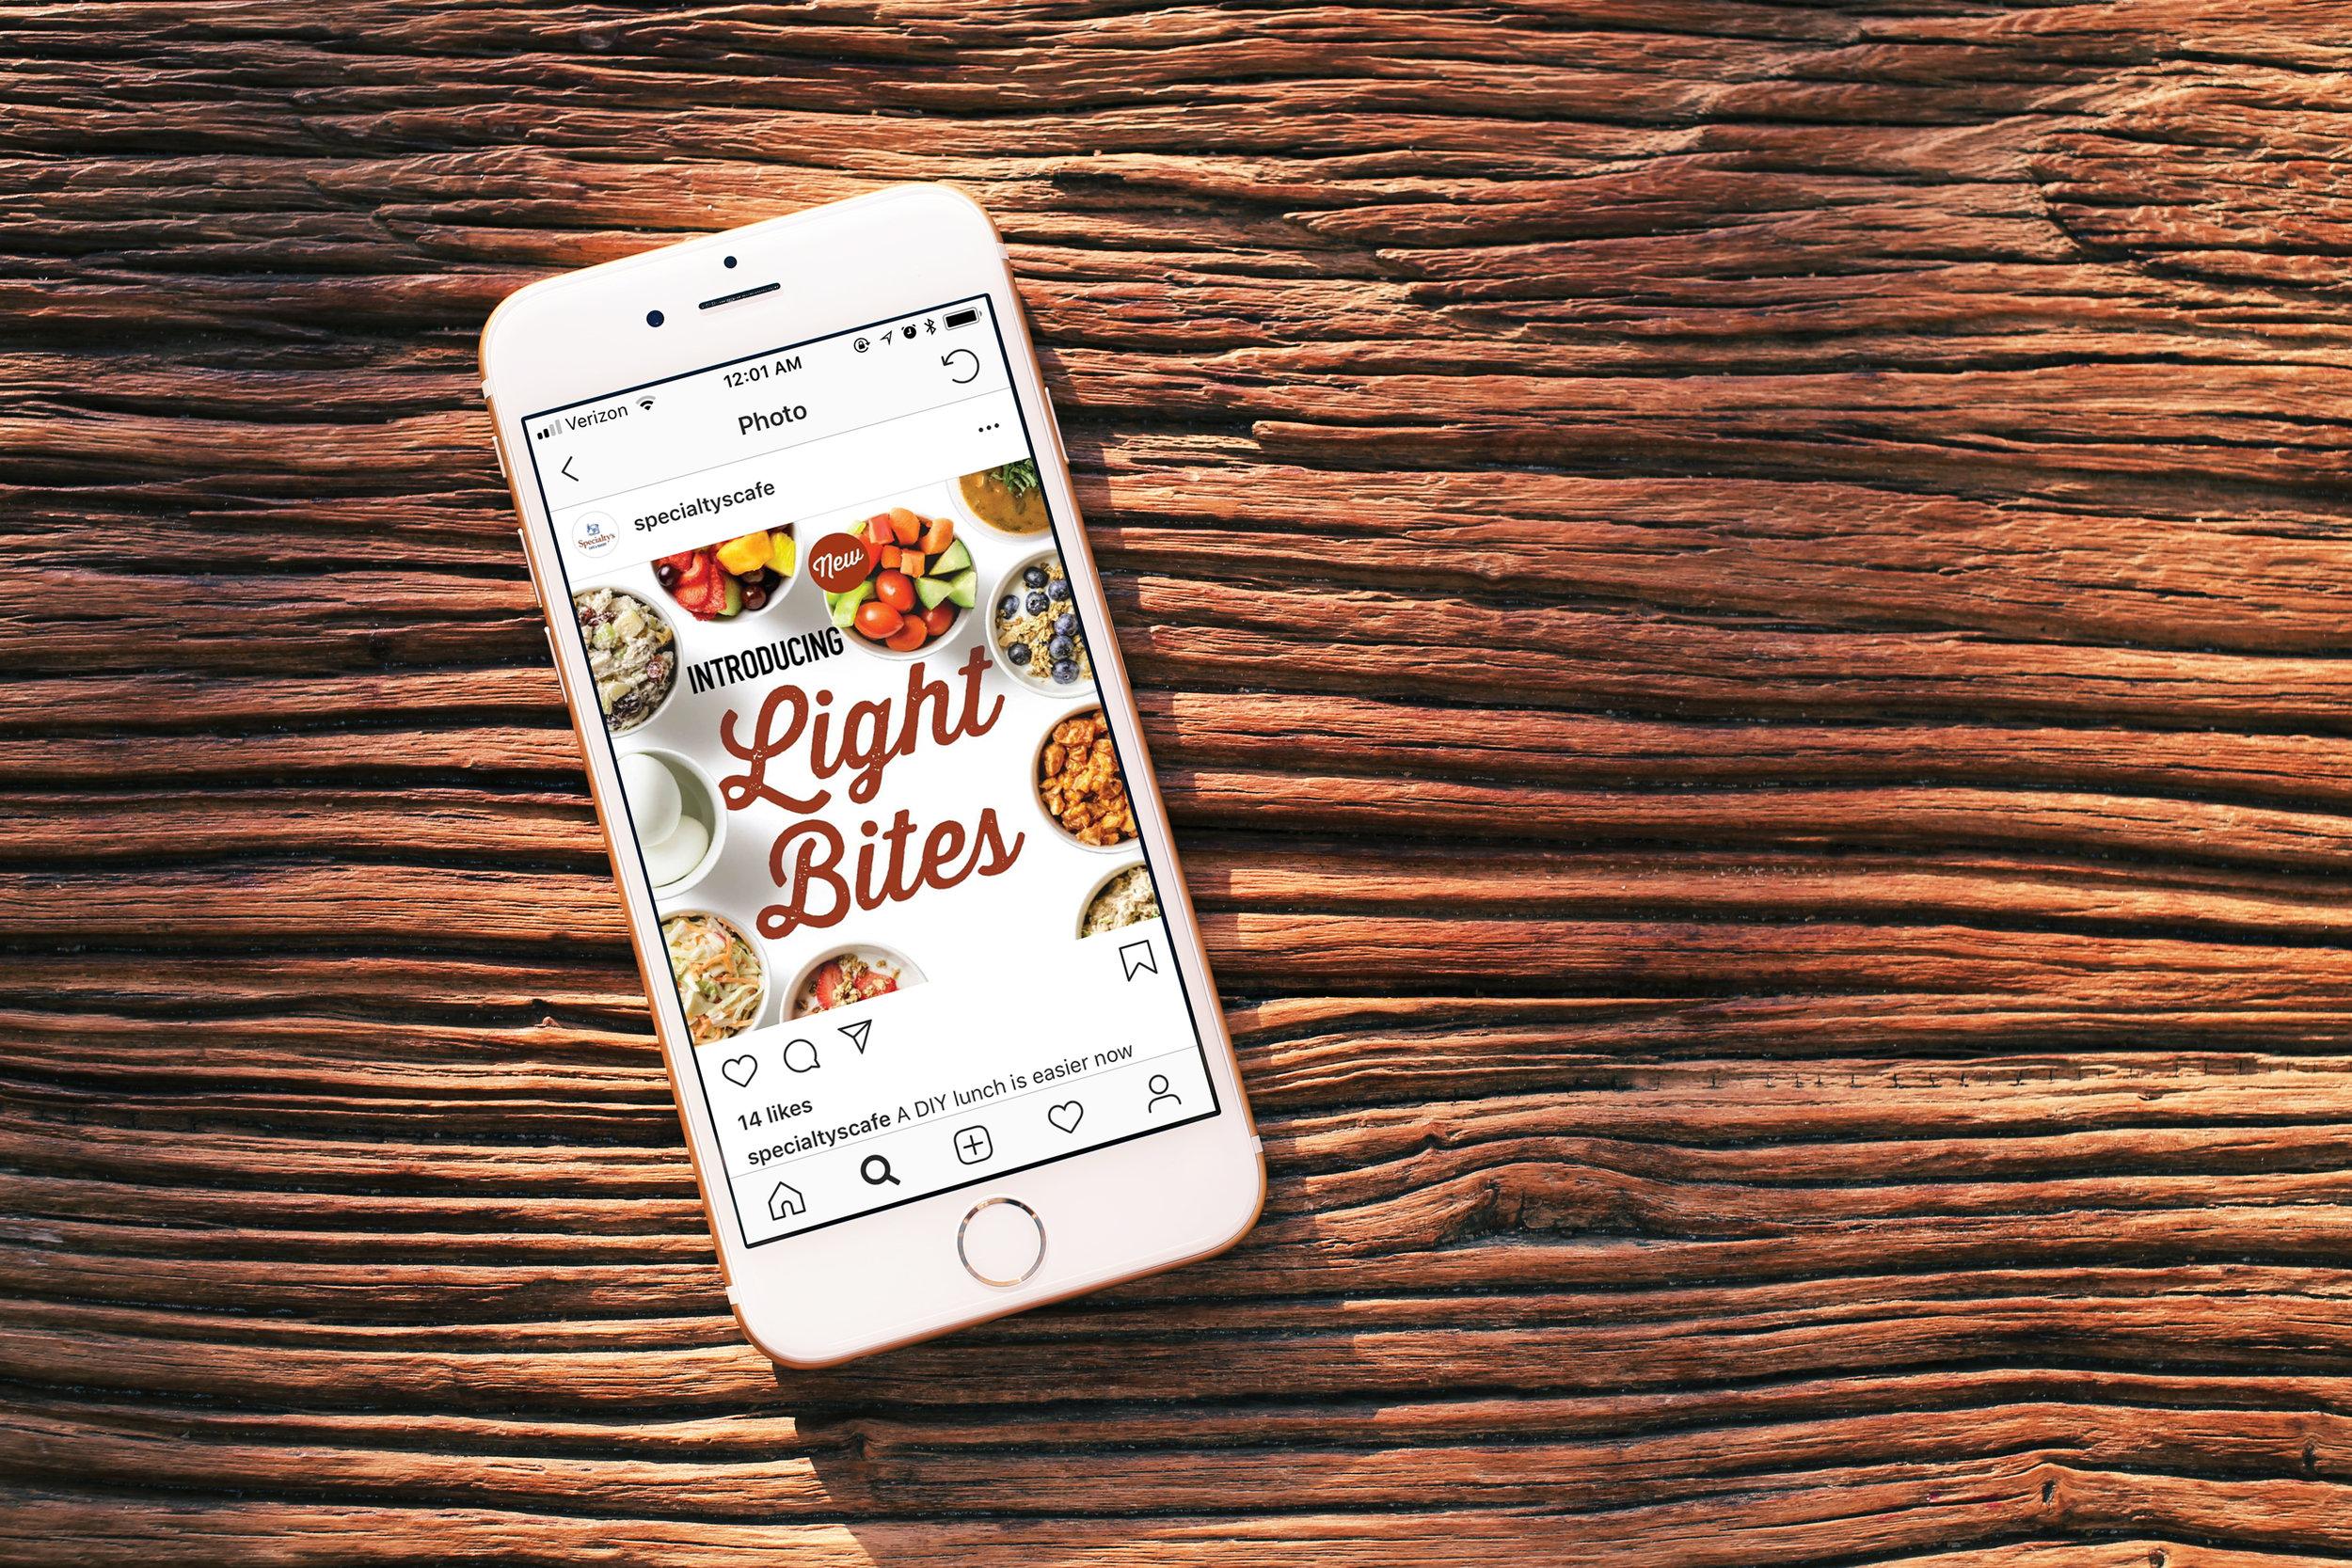 DIY Lunch campaign social media post